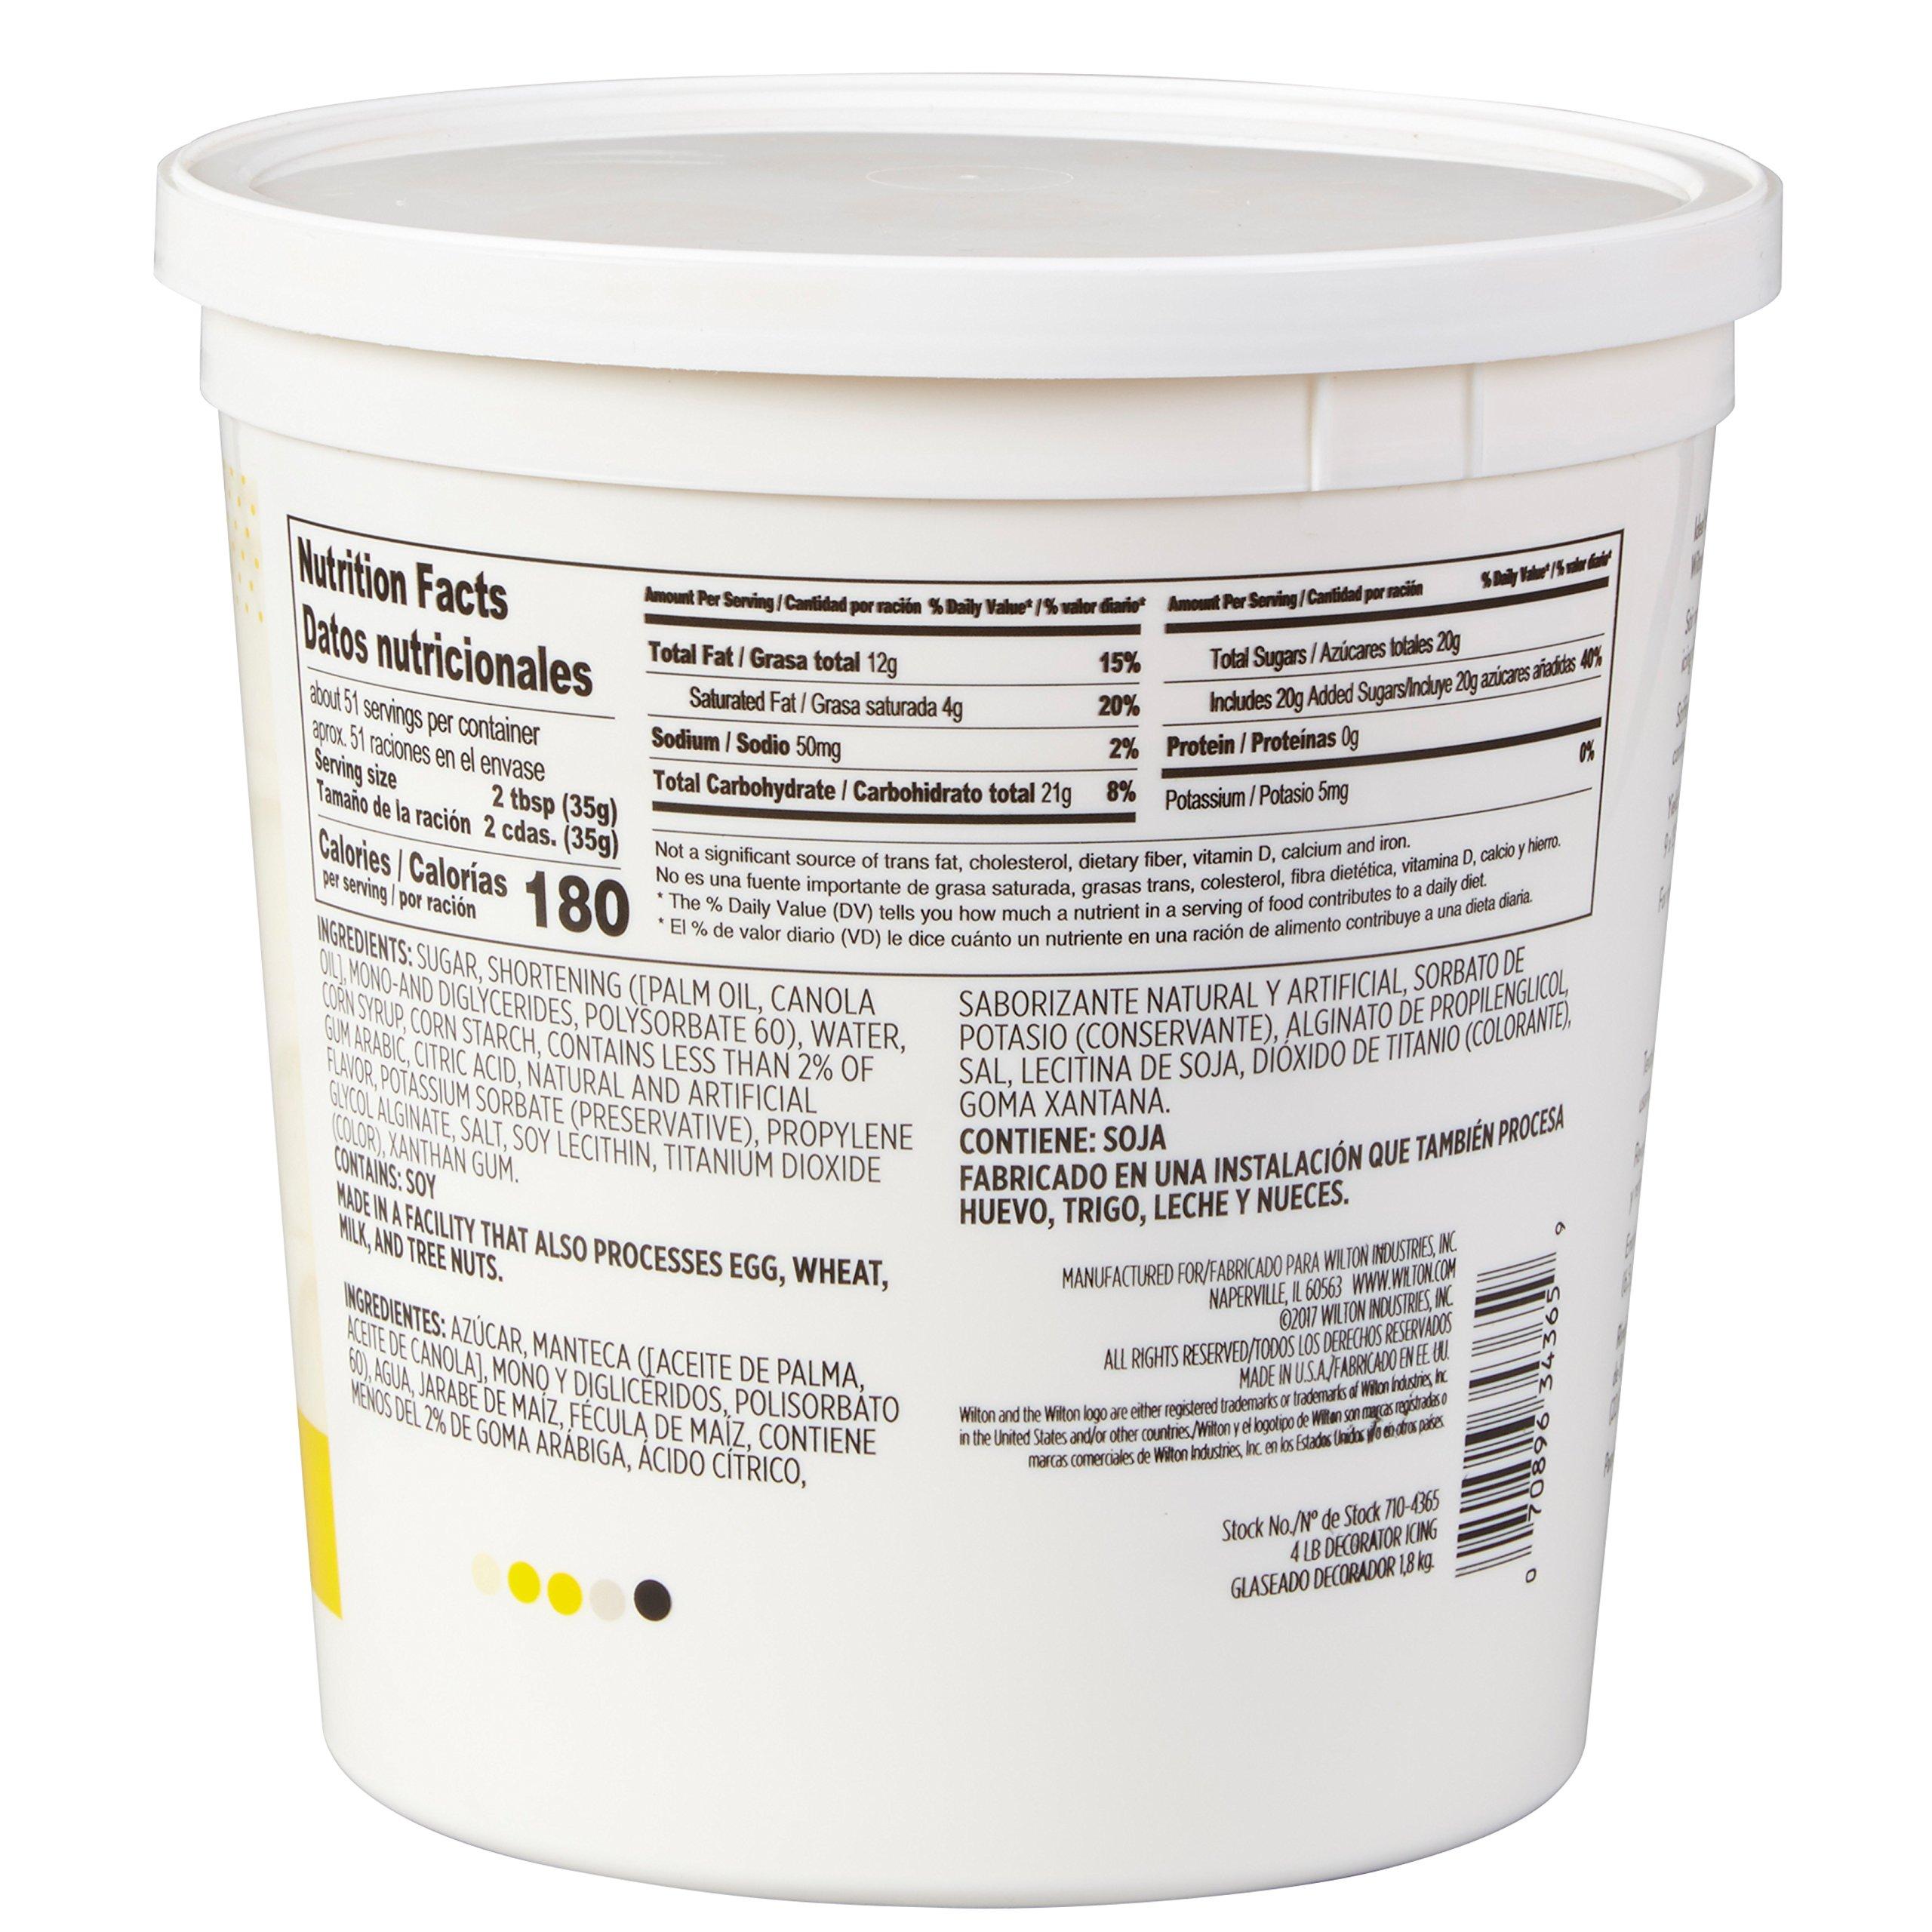 Wilton Creamy White Decorator Icing,Medium Consistency,4 lb. Tub, Cake Decorating Supplies by Wilton (Image #2)